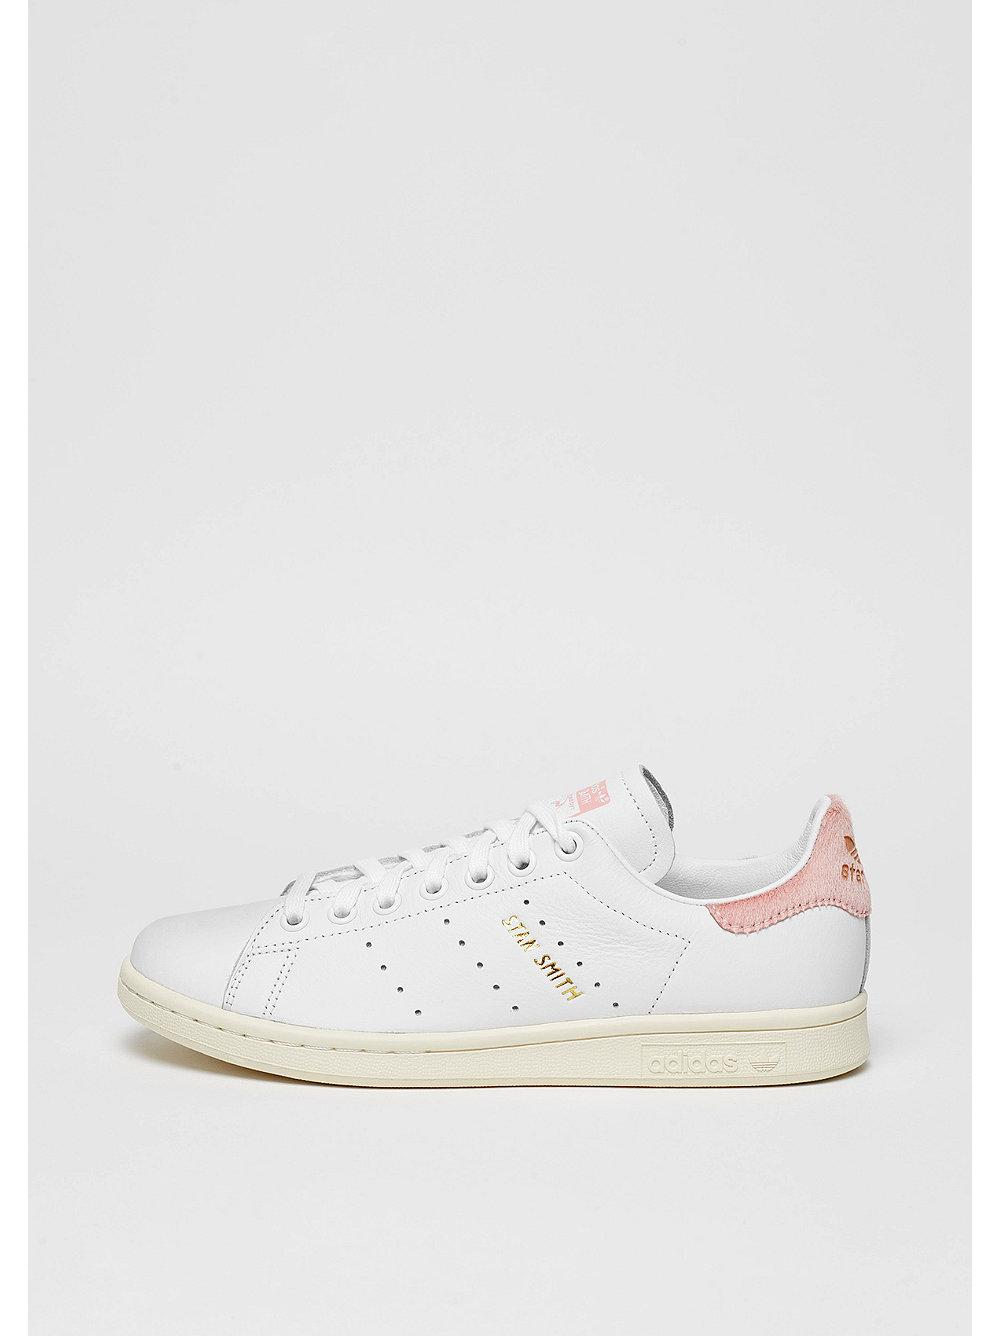 adidas Stan Smith W ftwr white-icey pink-off white